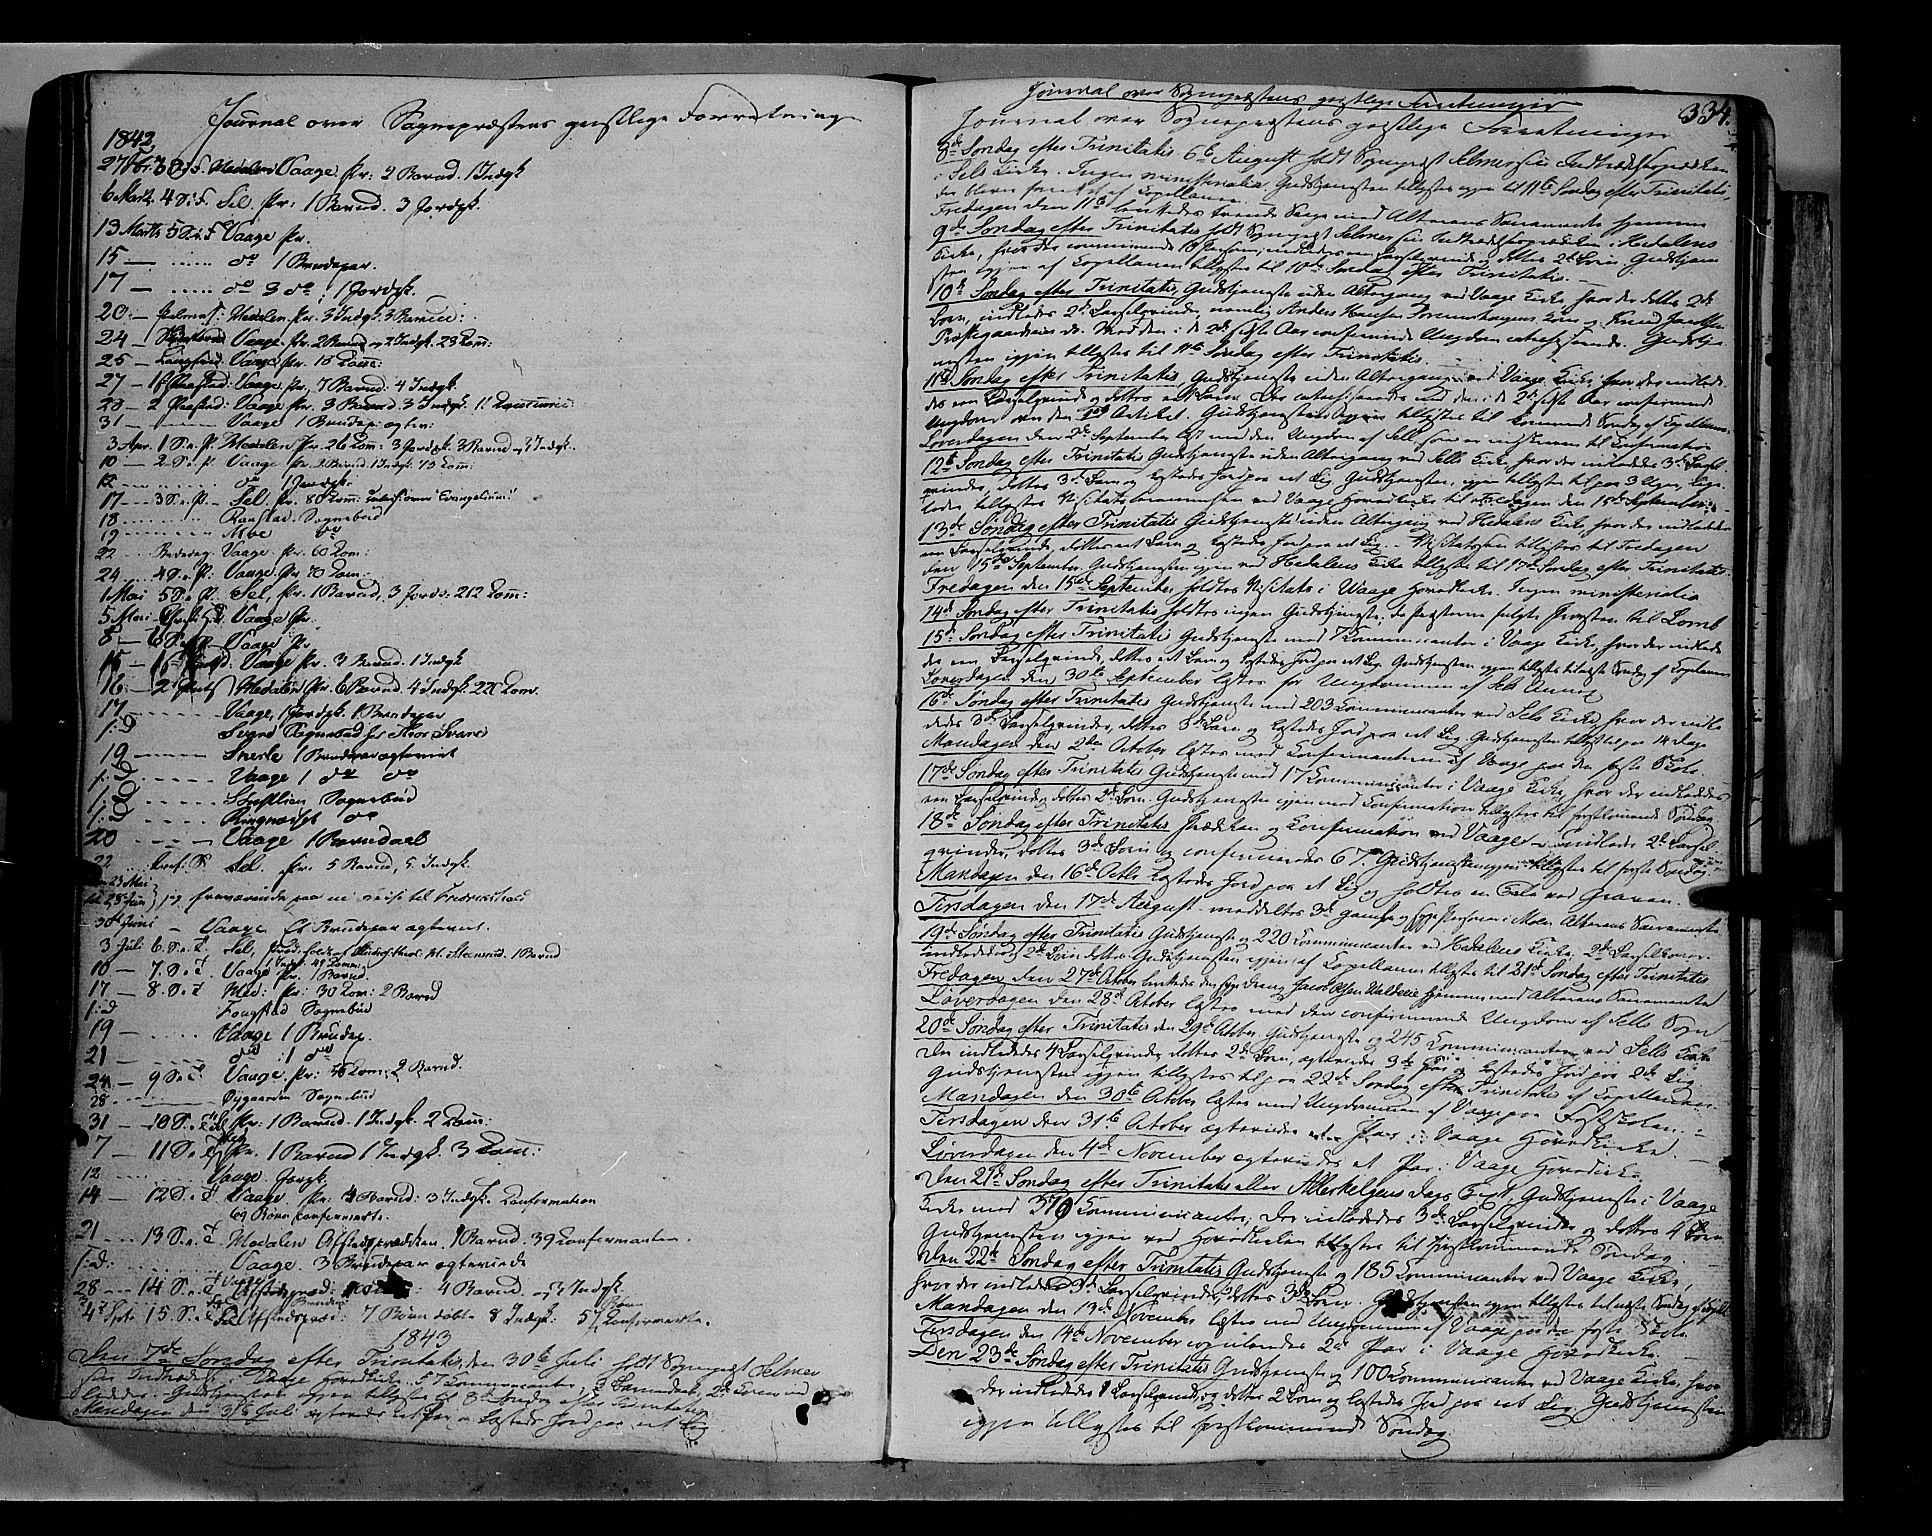 SAH, Vågå prestekontor, Ministerialbok nr. 5 /1, 1842-1856, s. 334